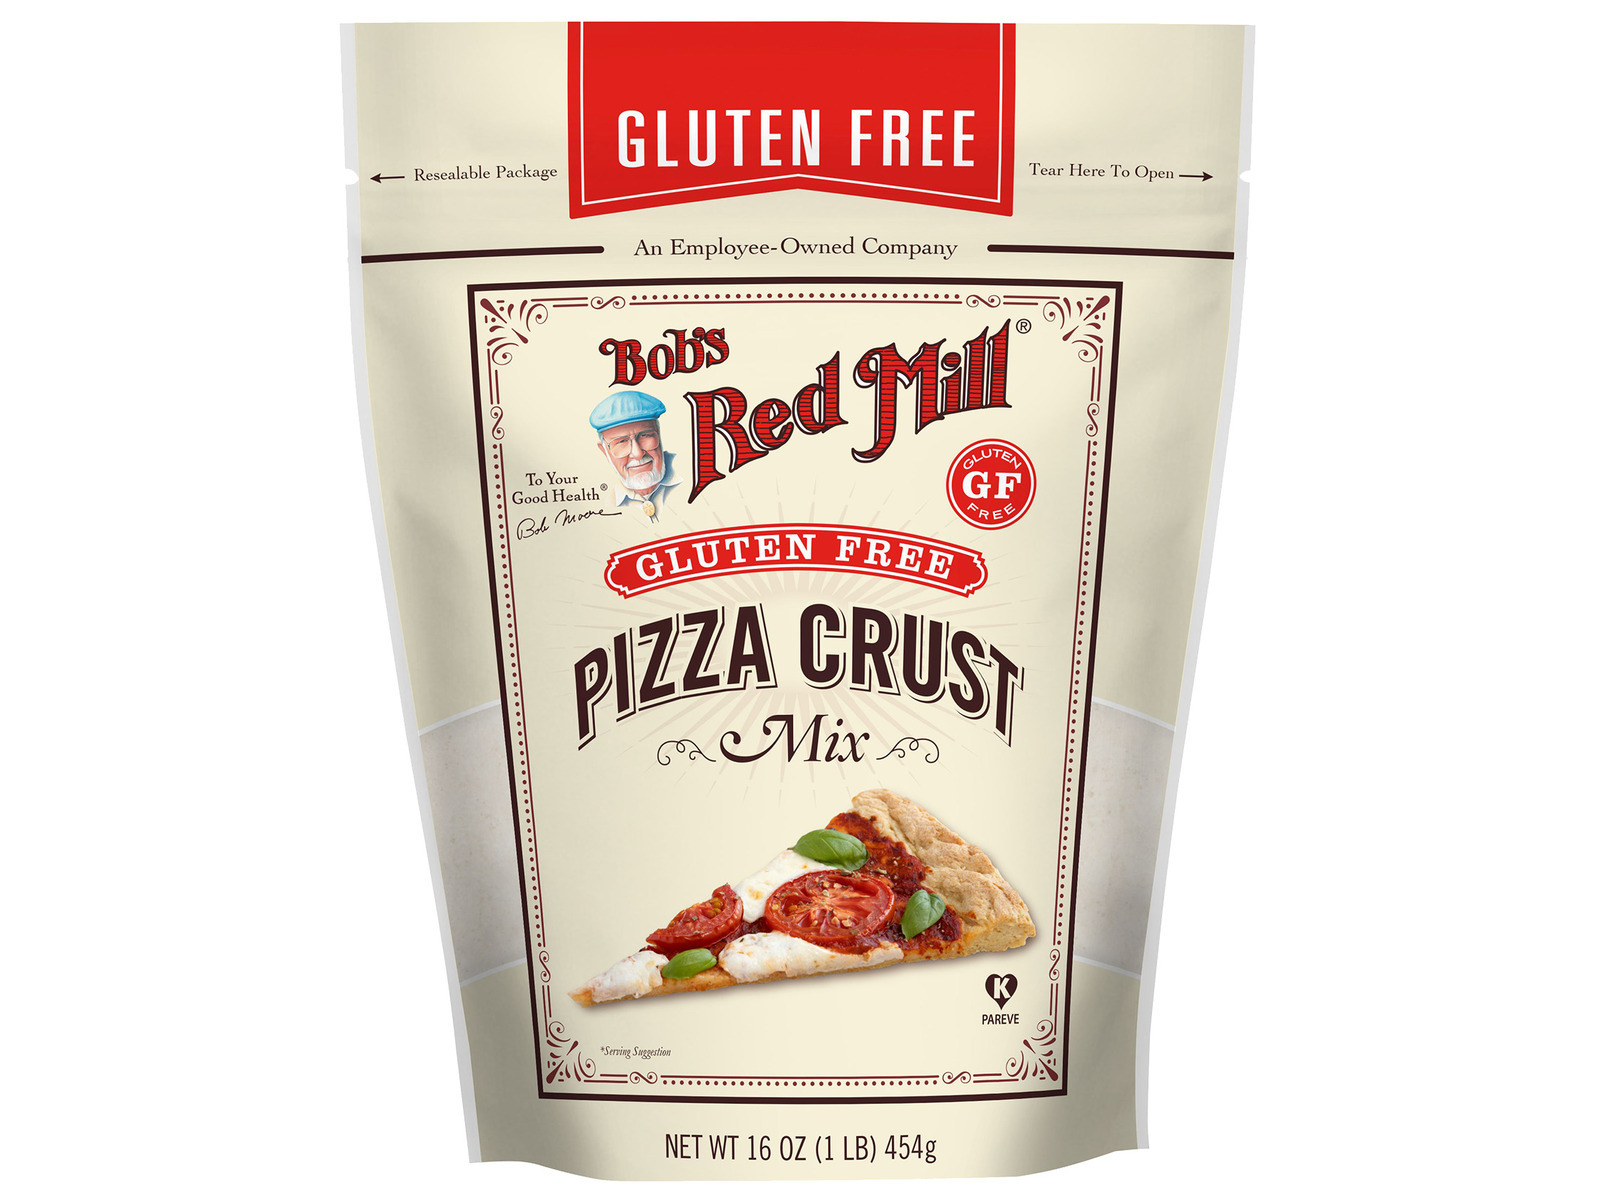 GF Pizza Crust Mix